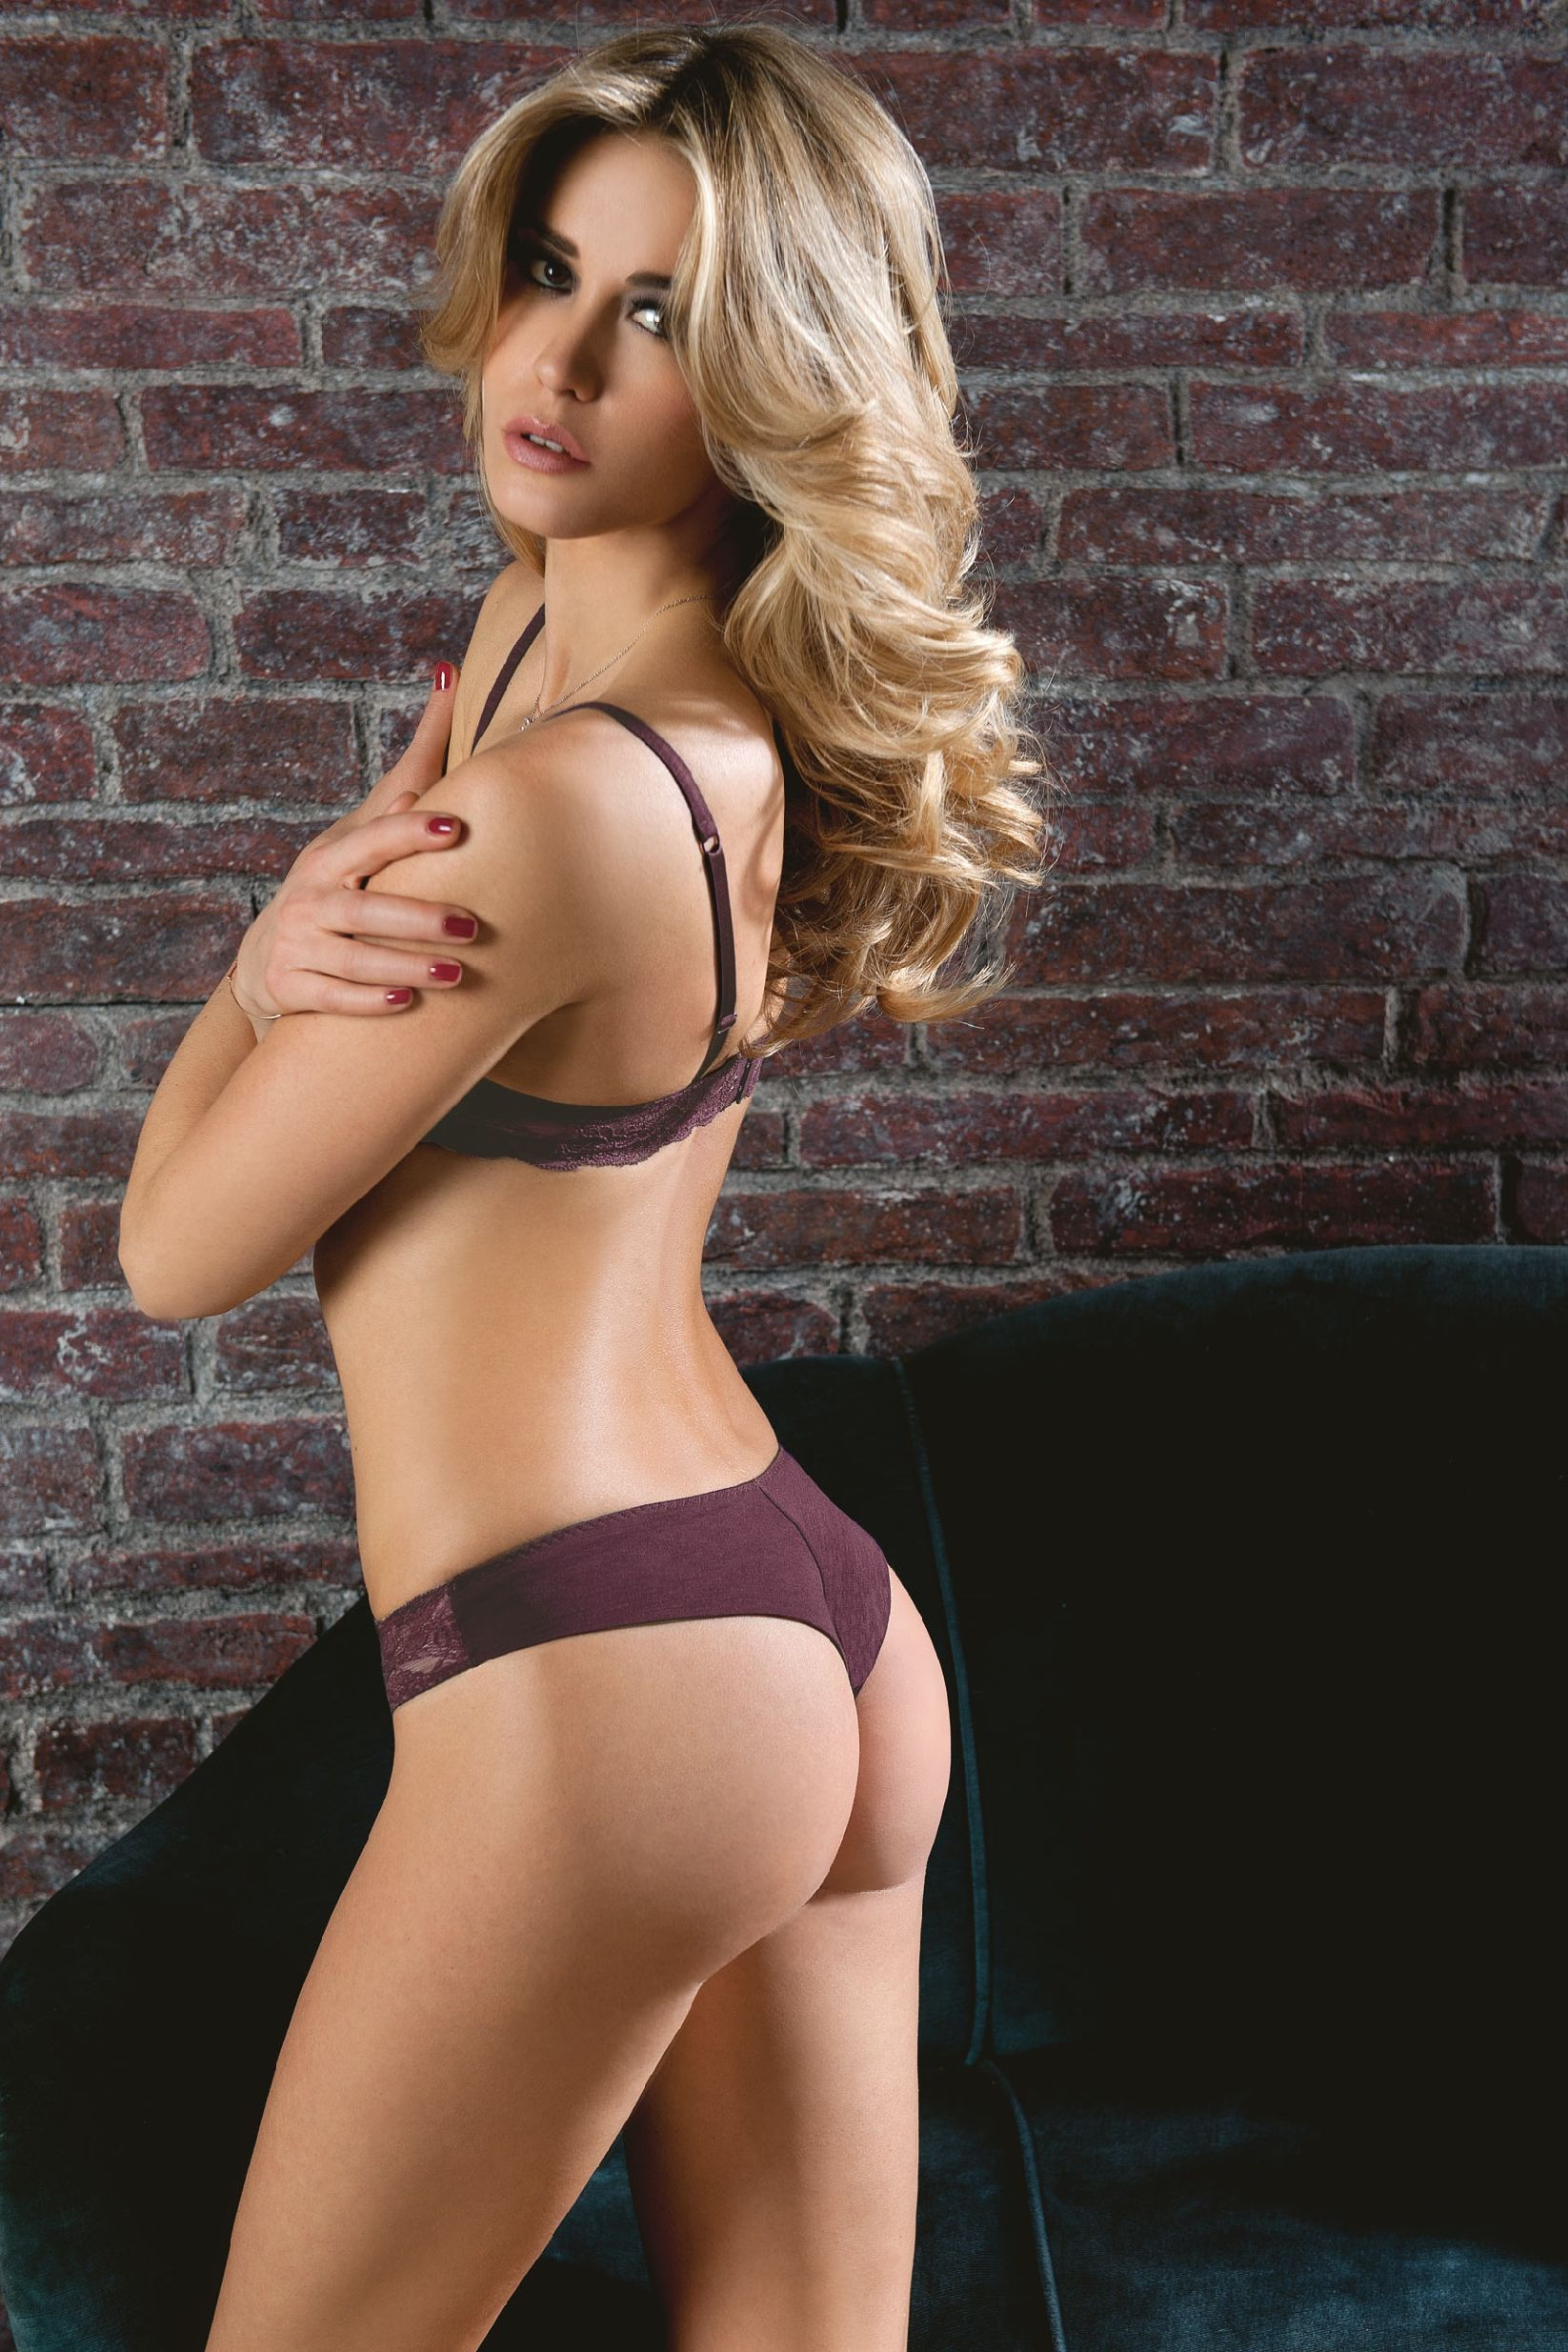 elena santarelli was born to wear lingerie | w elena | pinterest